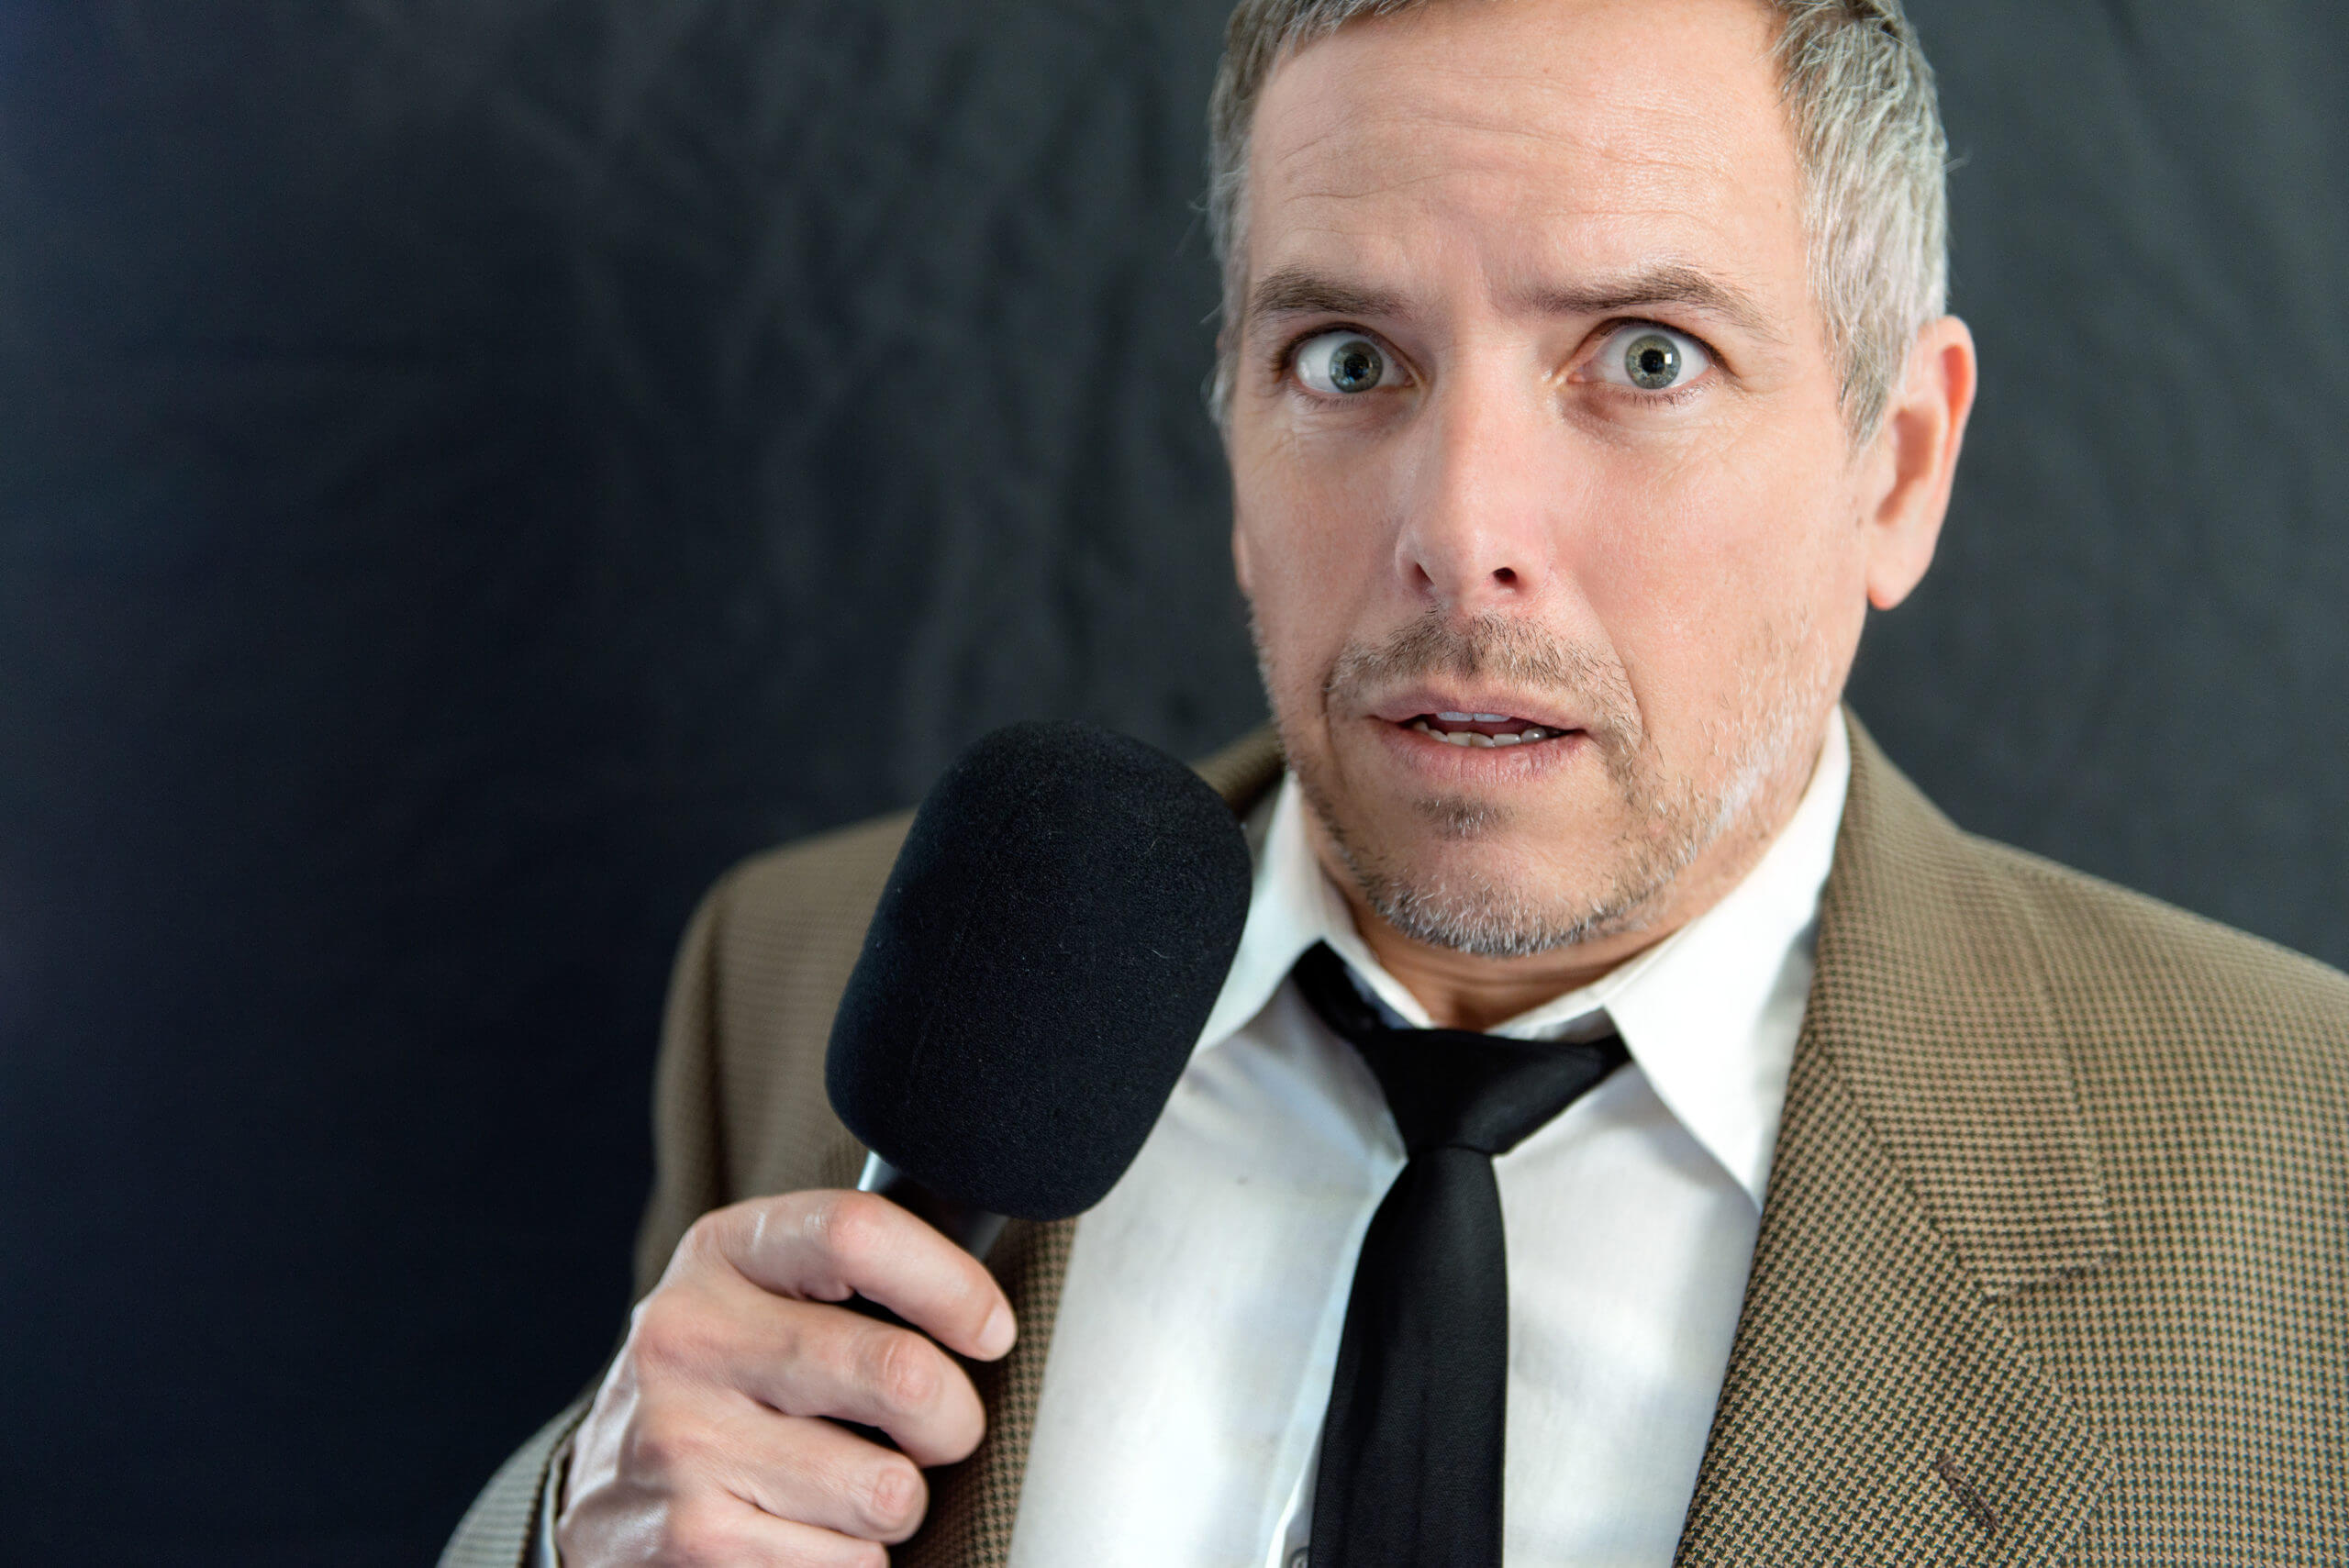 man having anxiety when speaking